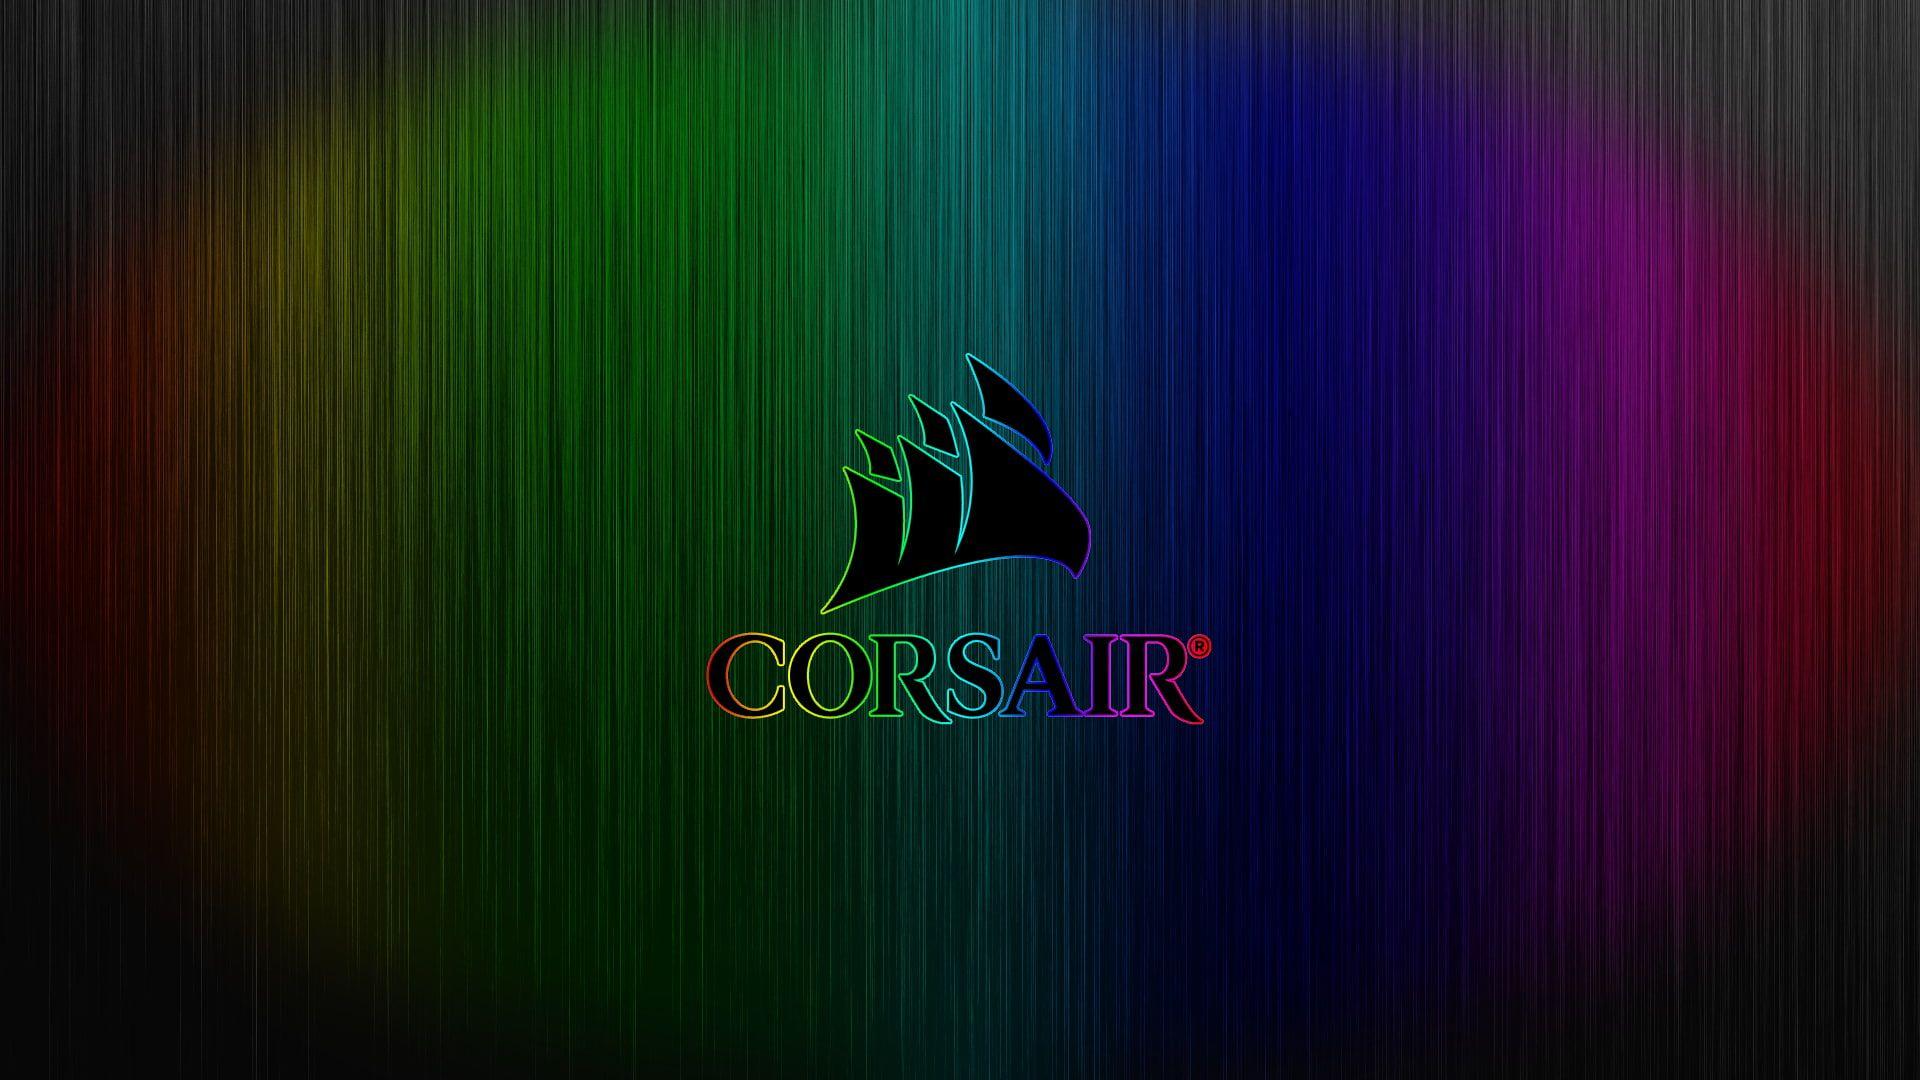 Corsair Rgb Texture Pattern 1080p Wallpaper Hdwallpaper Desktop Gaming Wallpapers Logo Wallpaper Hd Iphone Wallpaper